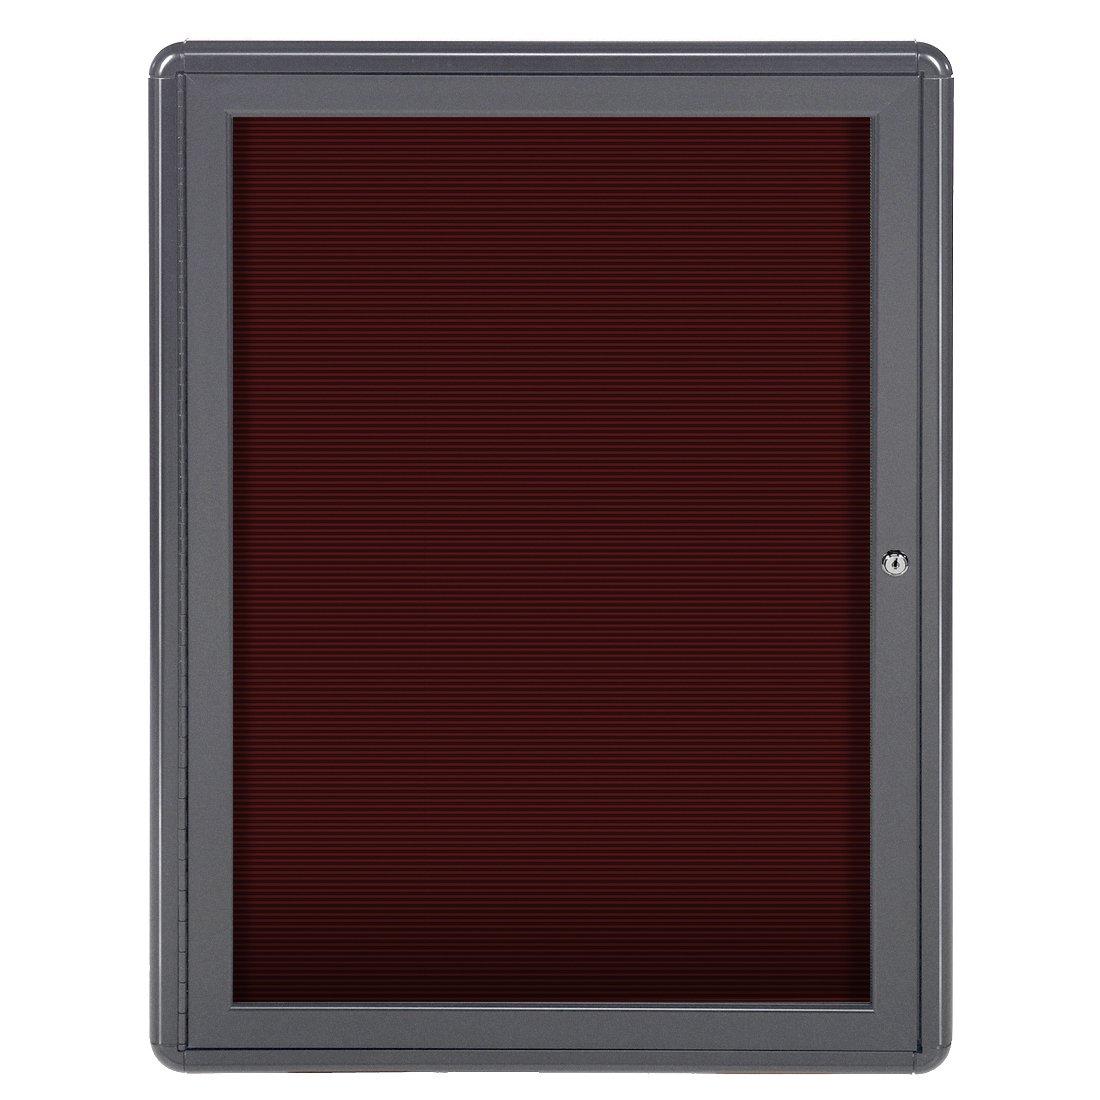 Ghent 34'' x 24'' Ovation Letter Board Burgundy, Gray Frame (OVG1-BBG)